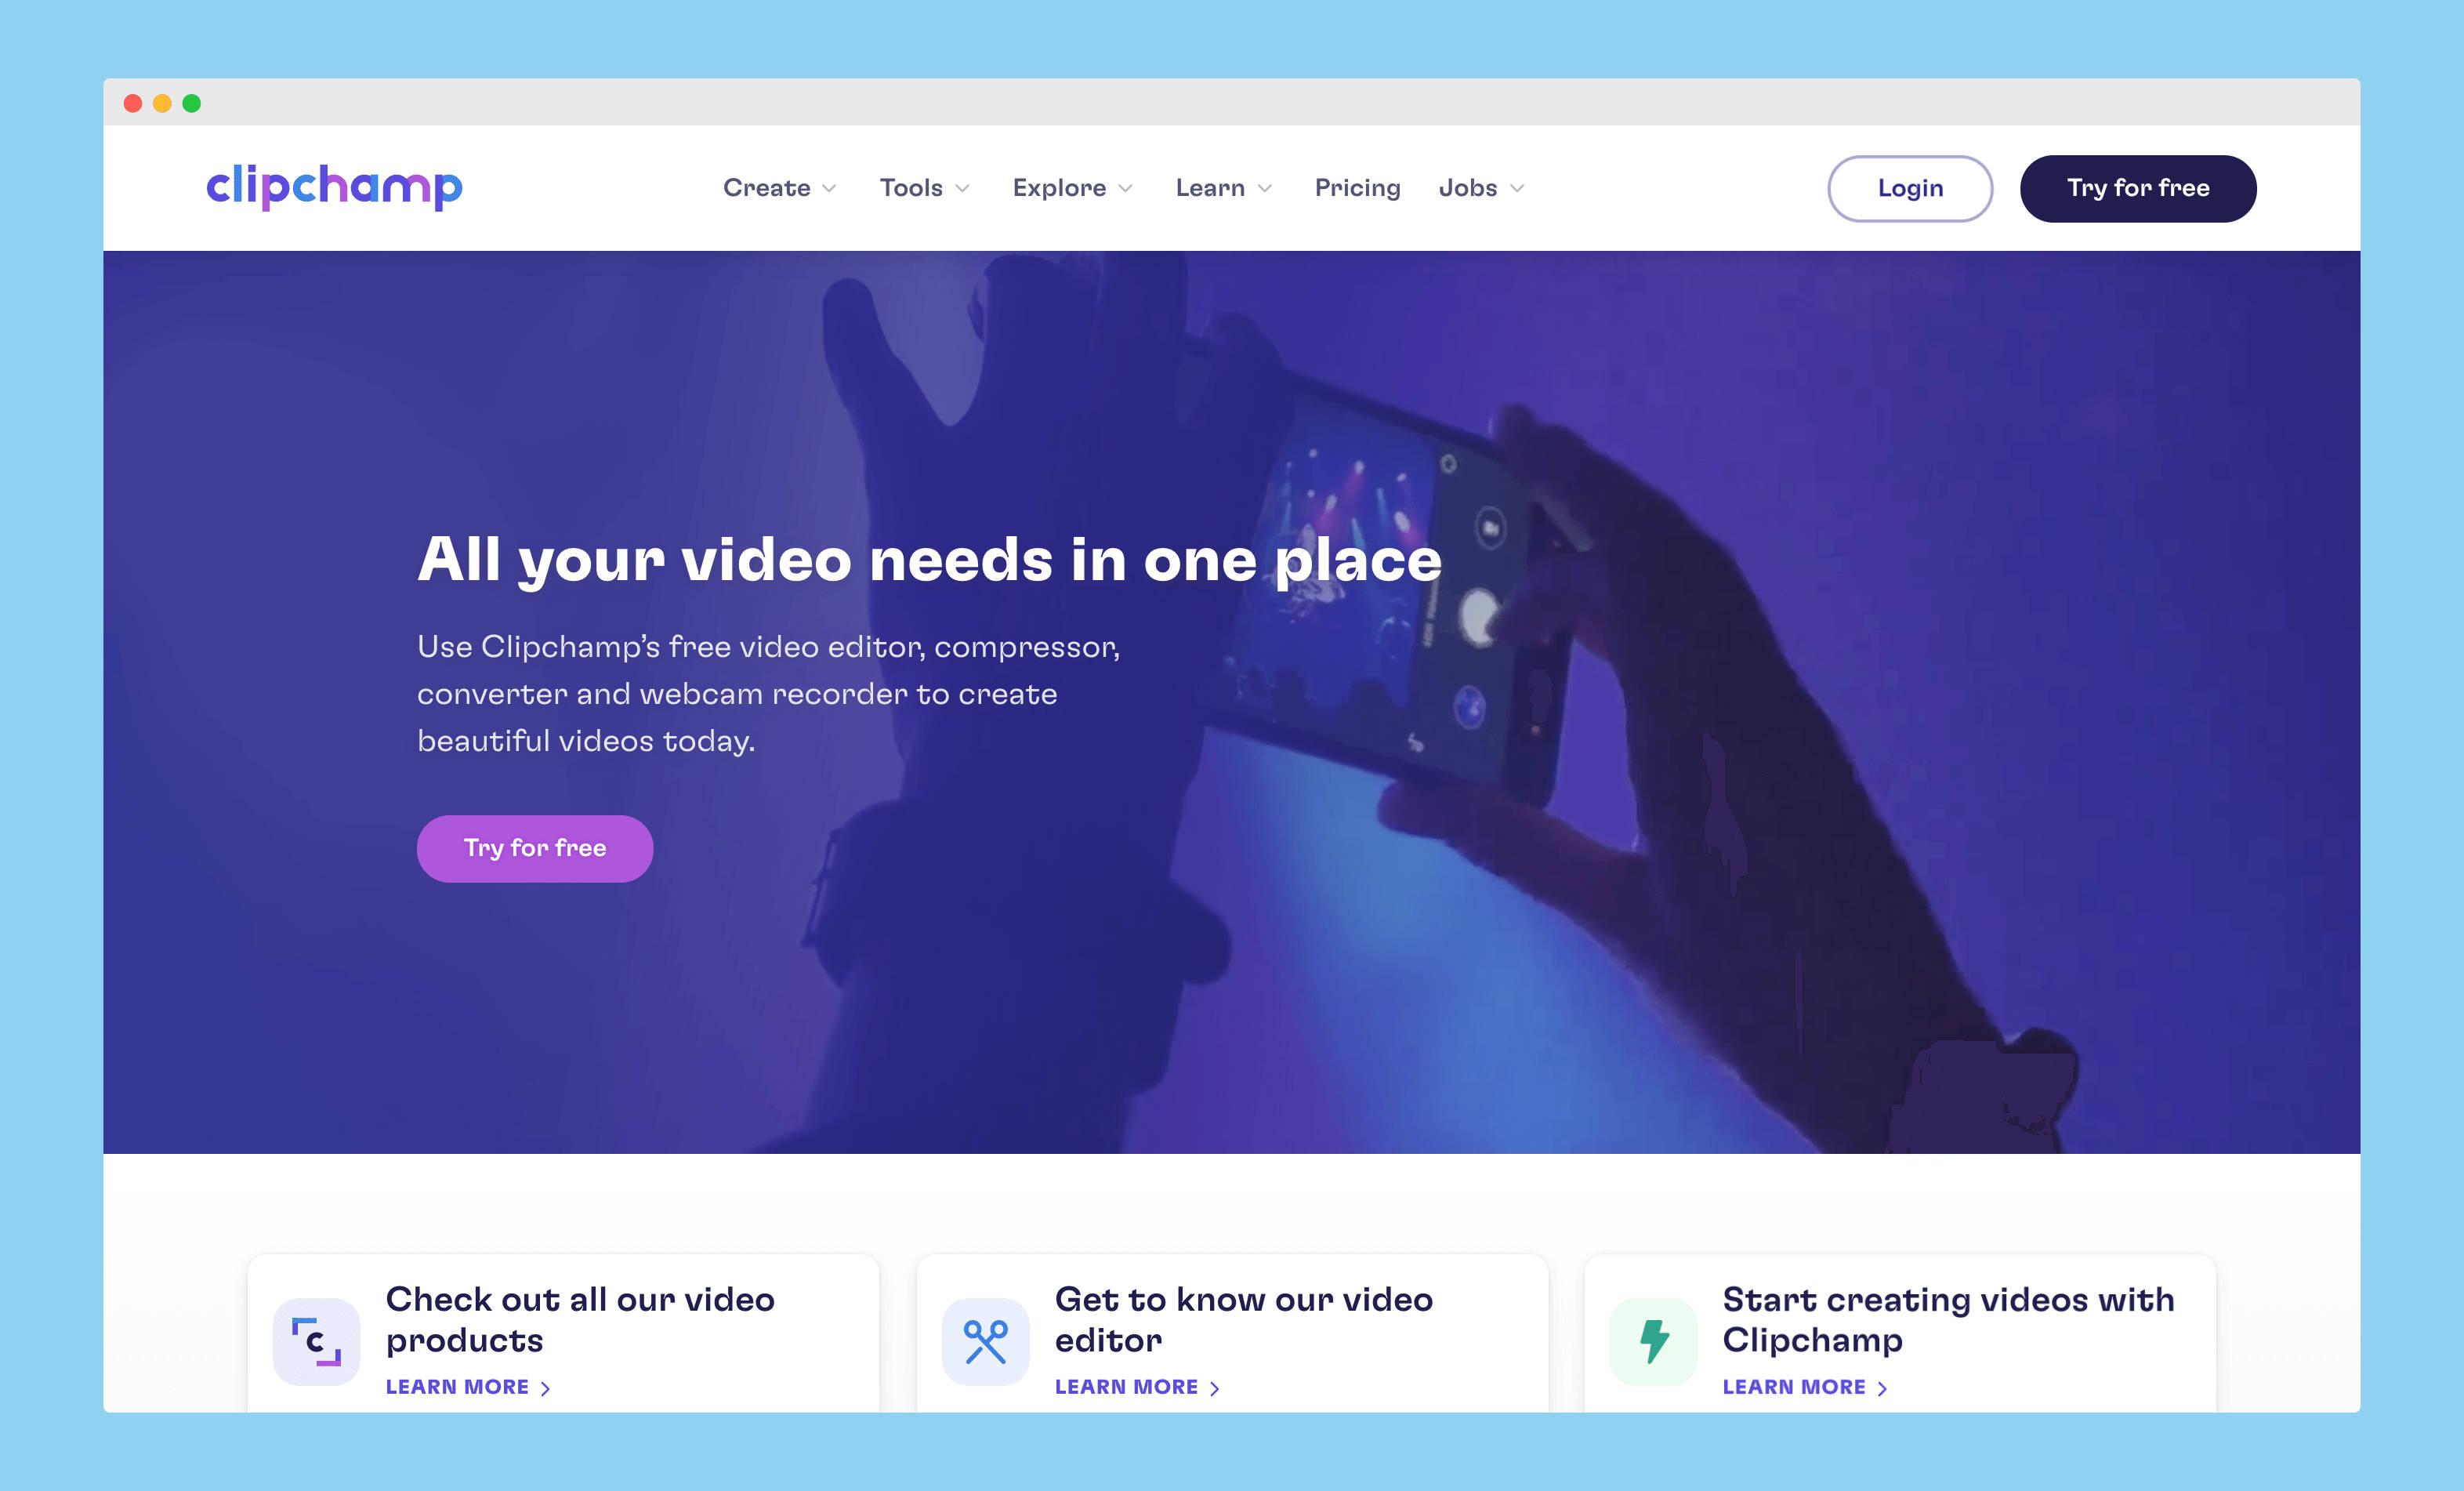 best video editing website, free video editing software, video editing software